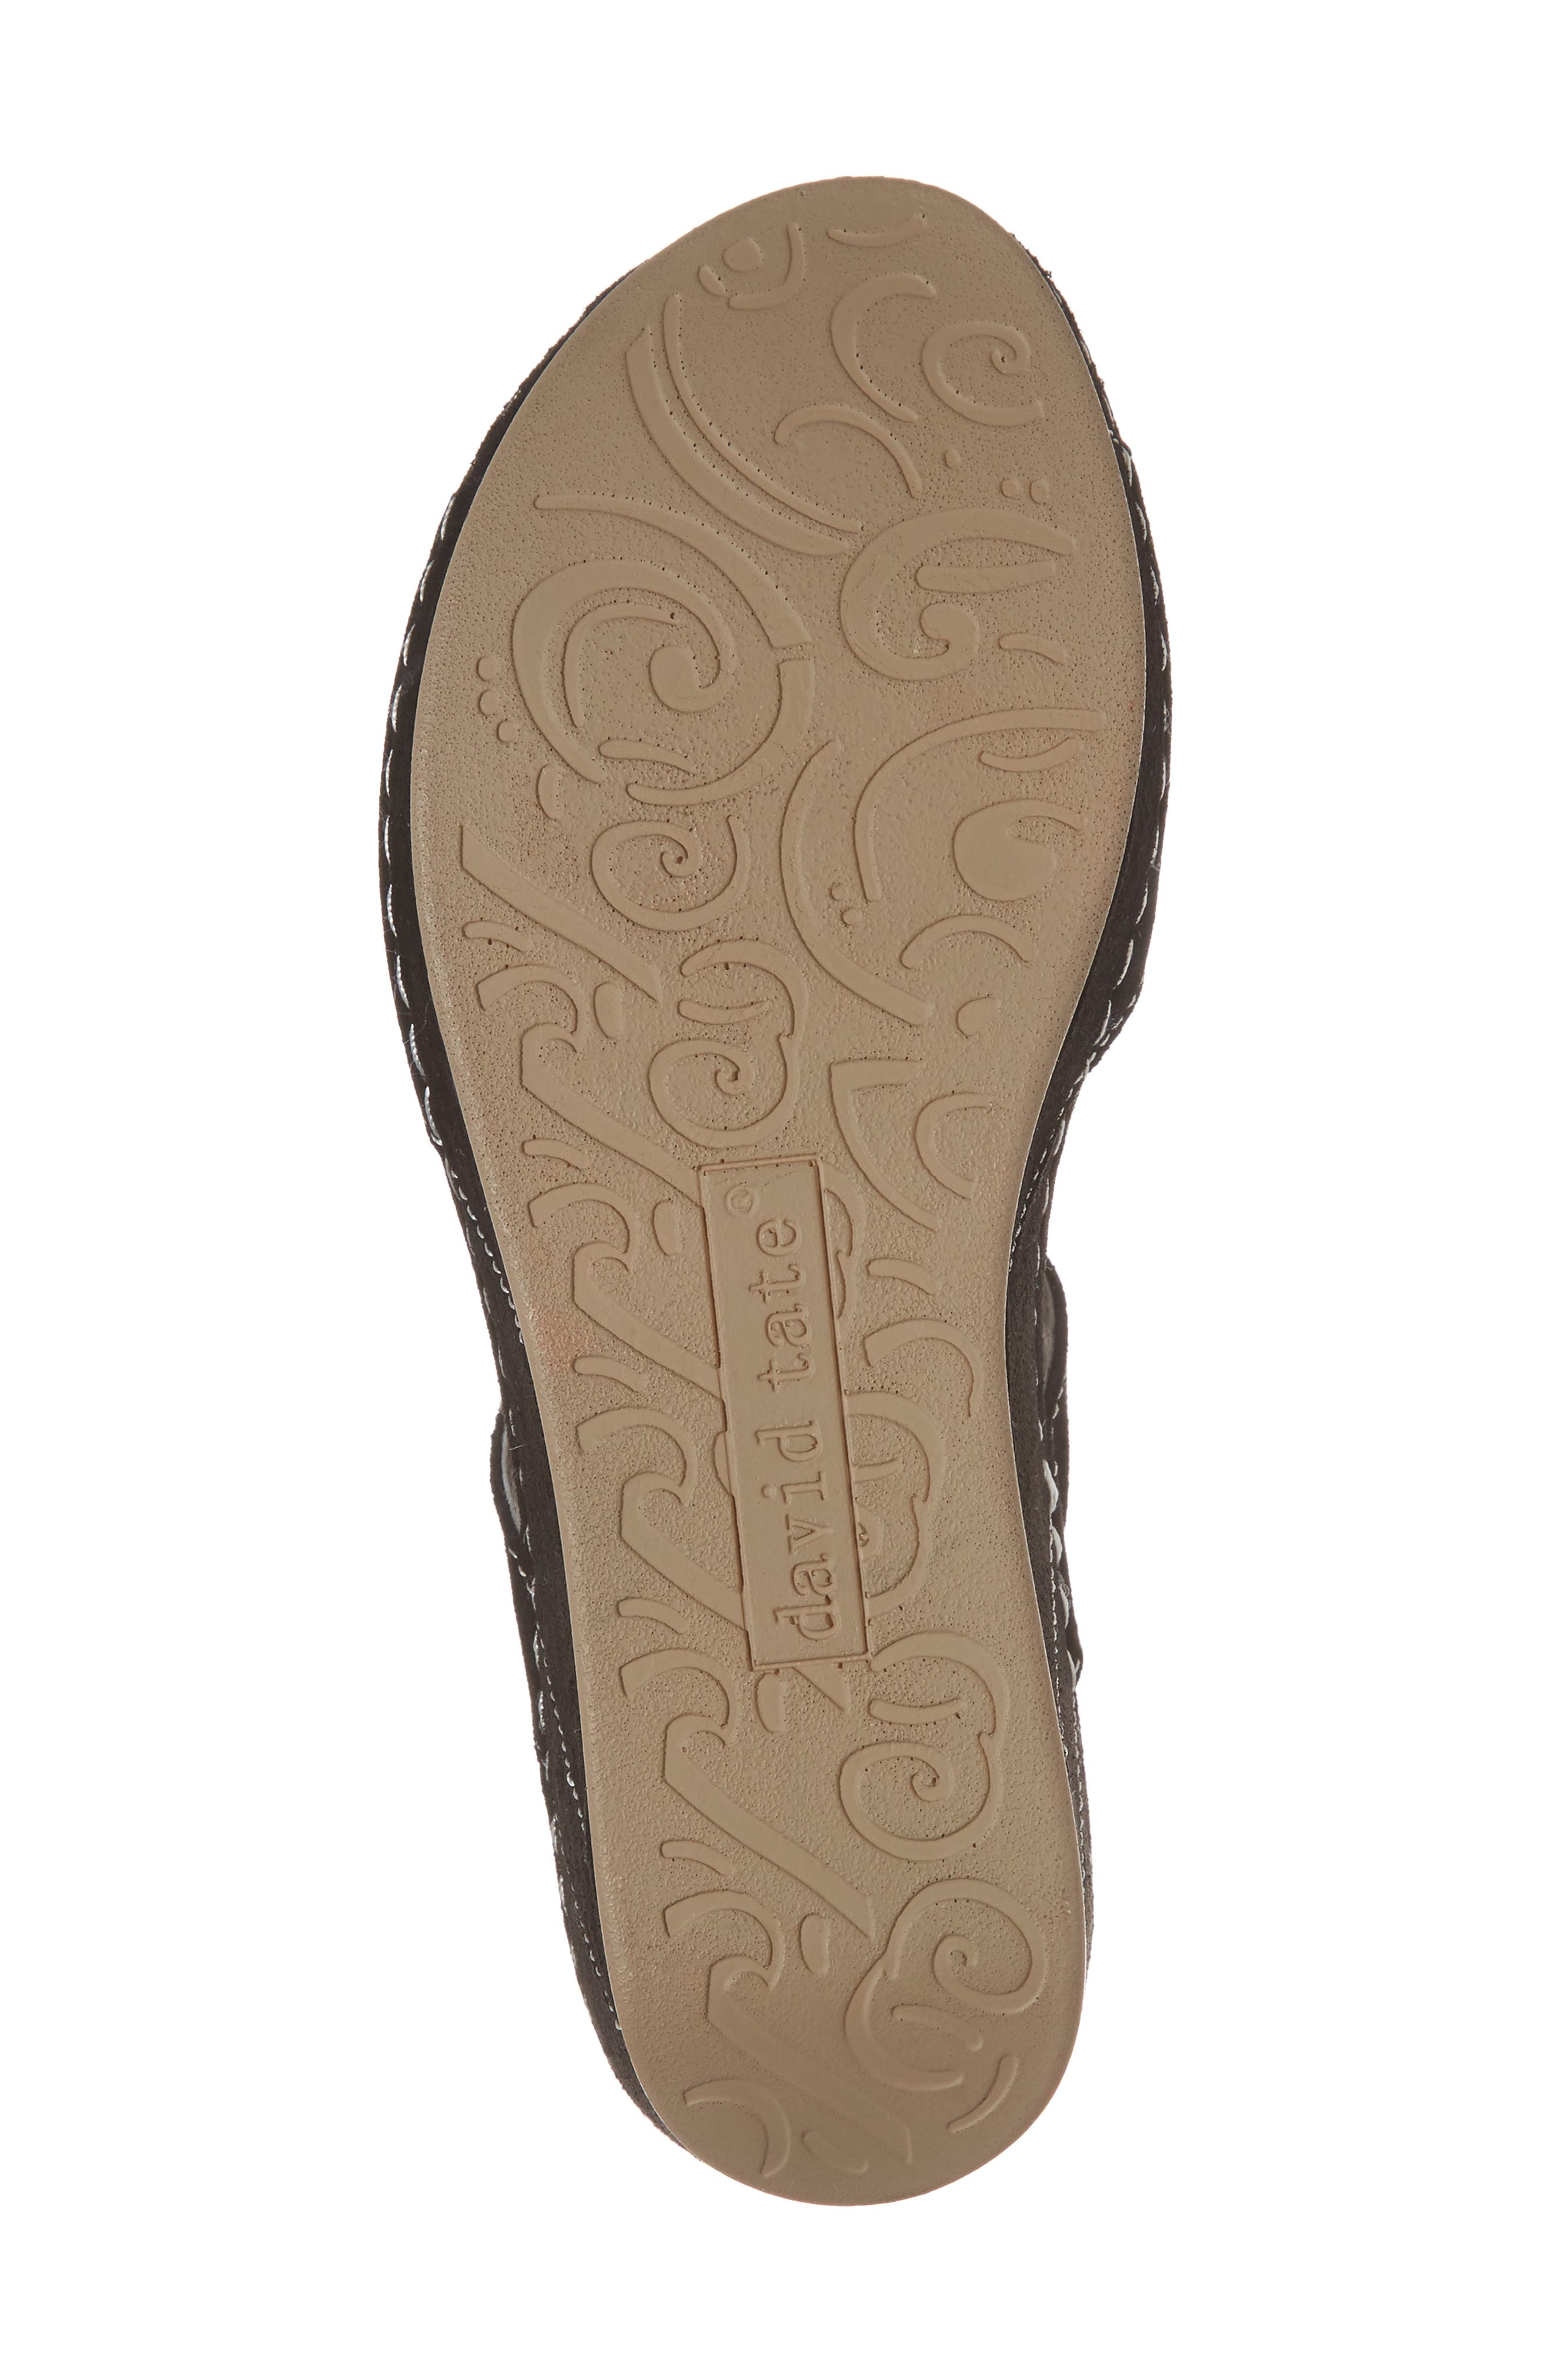 Bubbly Embellished T-Strap Wedge Sandal,                             Alternate thumbnail 6, color,                             Black Suede